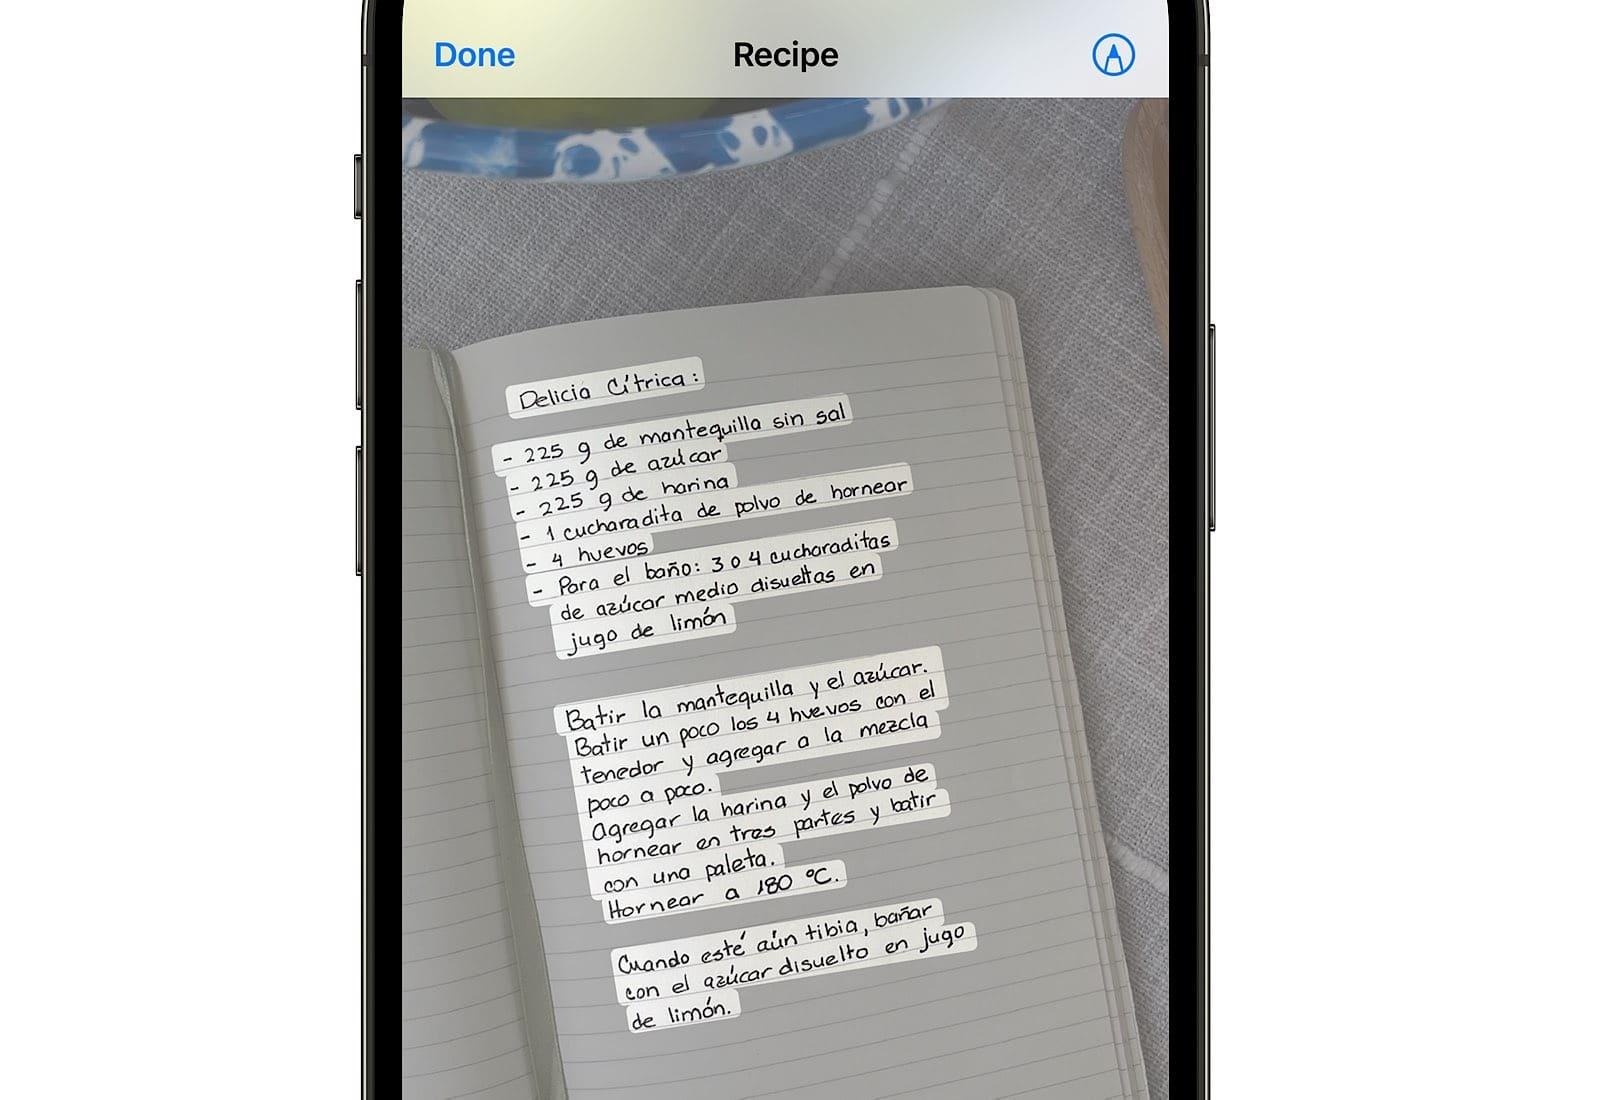 Apple's text transcription technology.